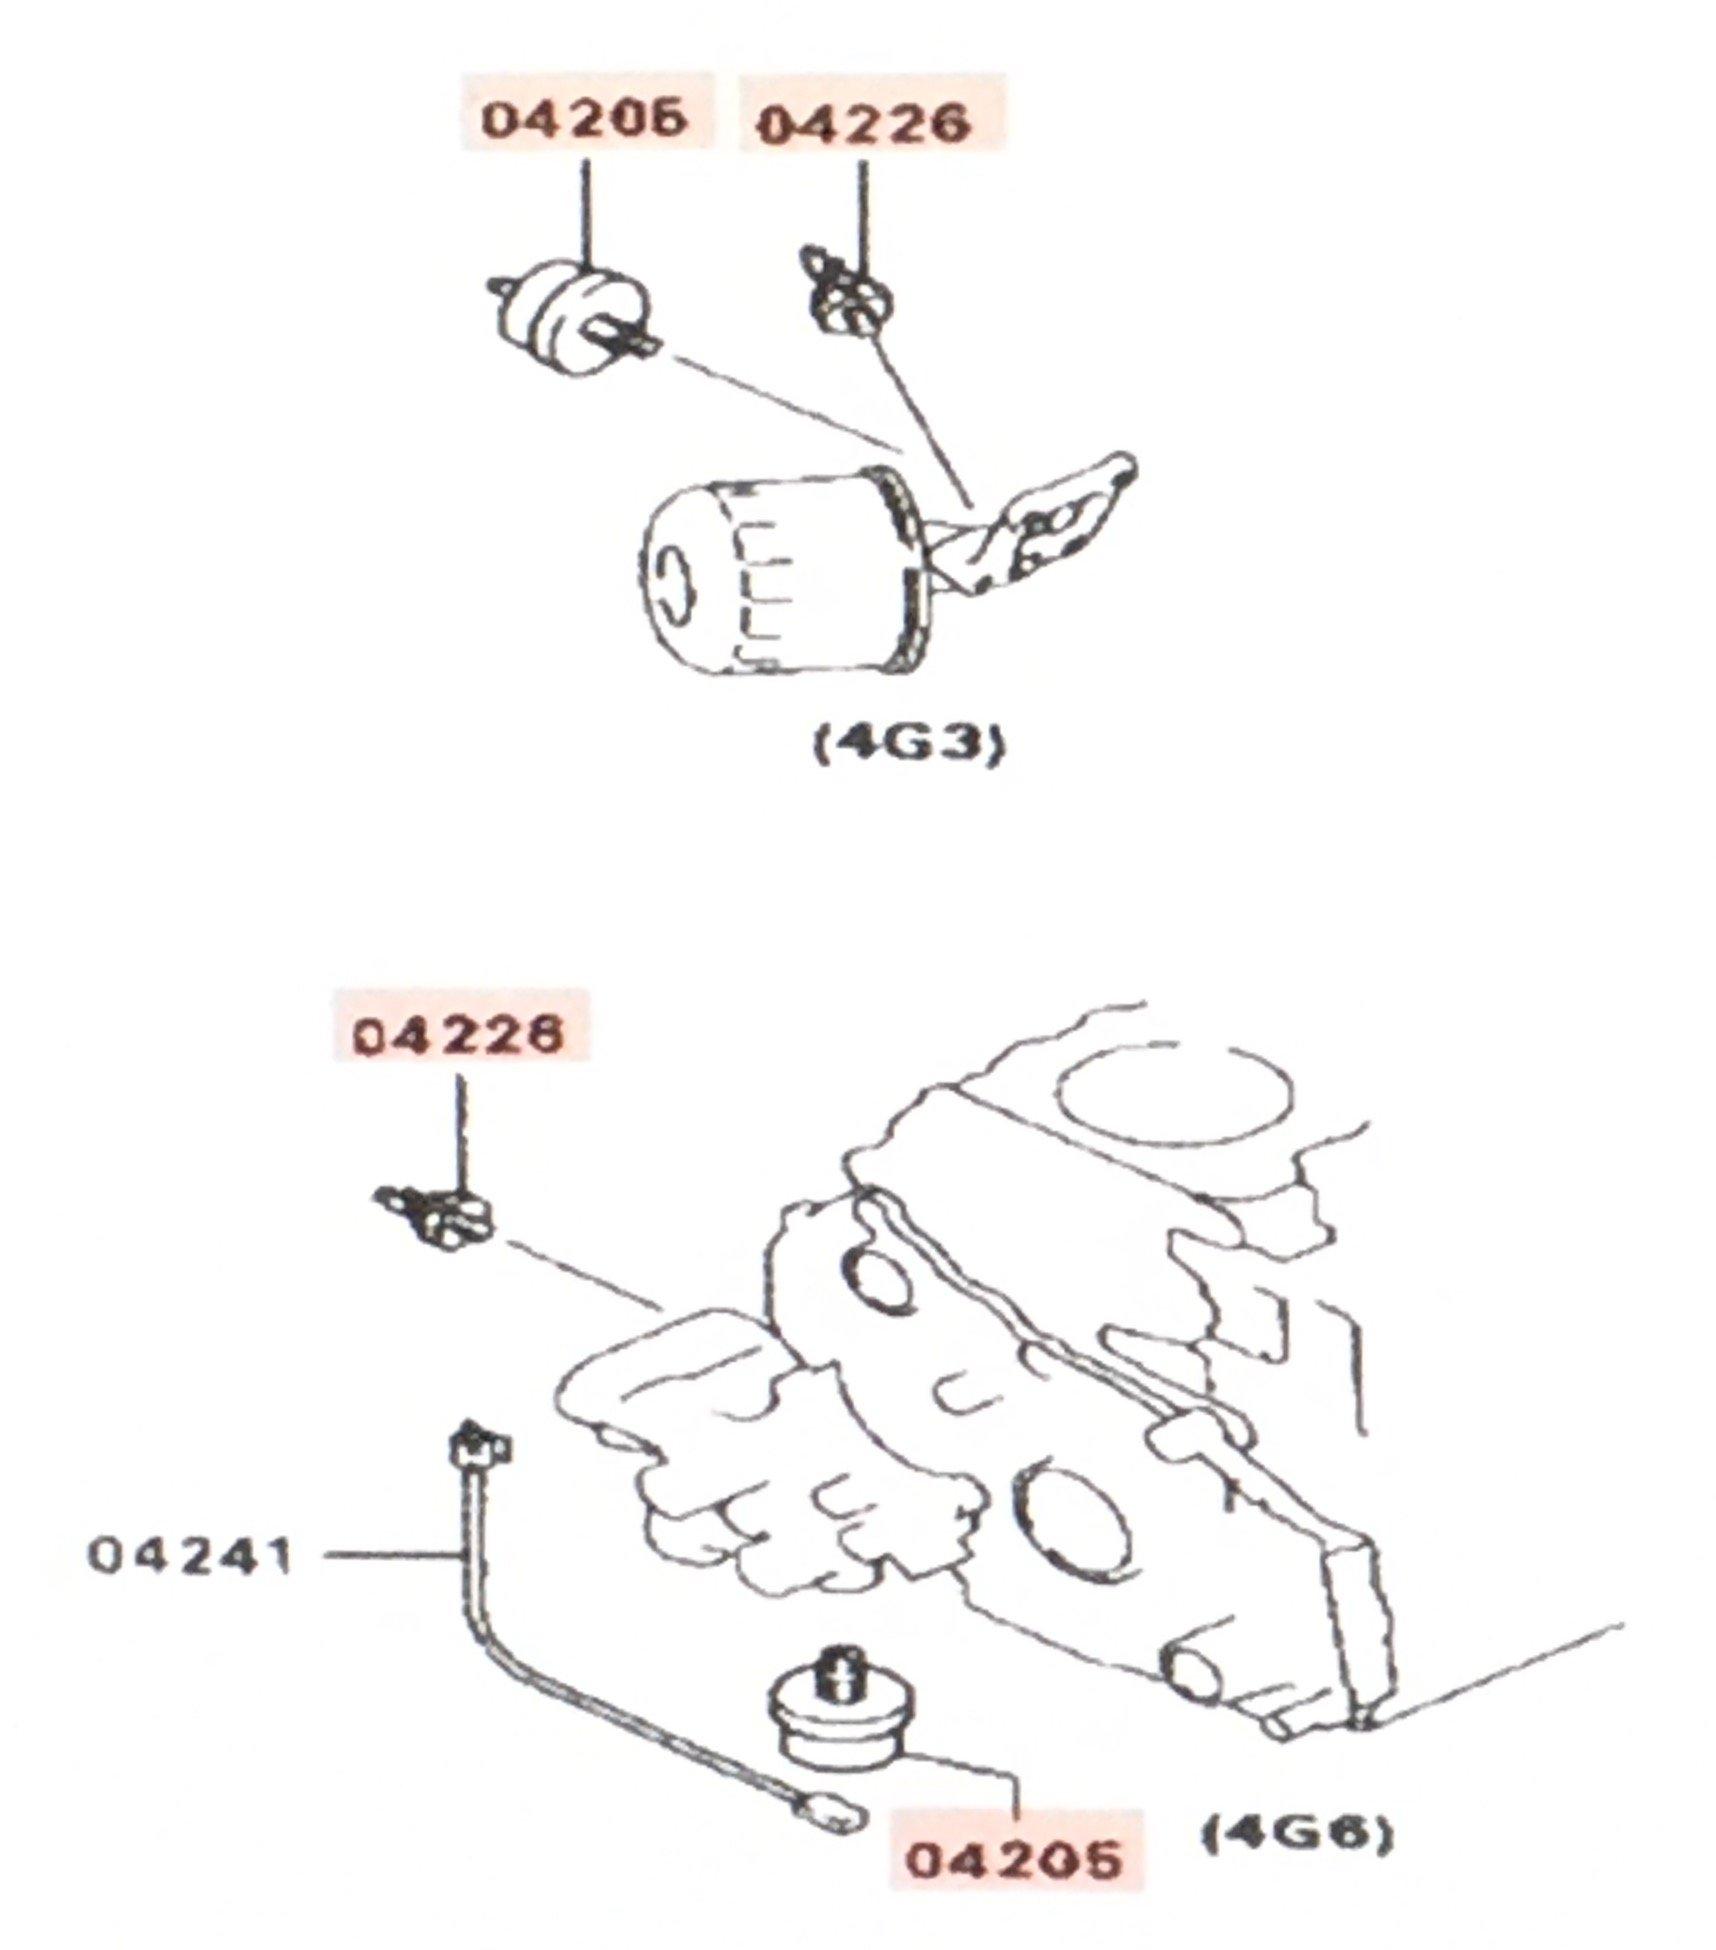 Mitsubishi Genuine Oil Pressure Sensor Set for Guage and Warning Light 1258A002 & MD133273 Eclipse 1990-1999